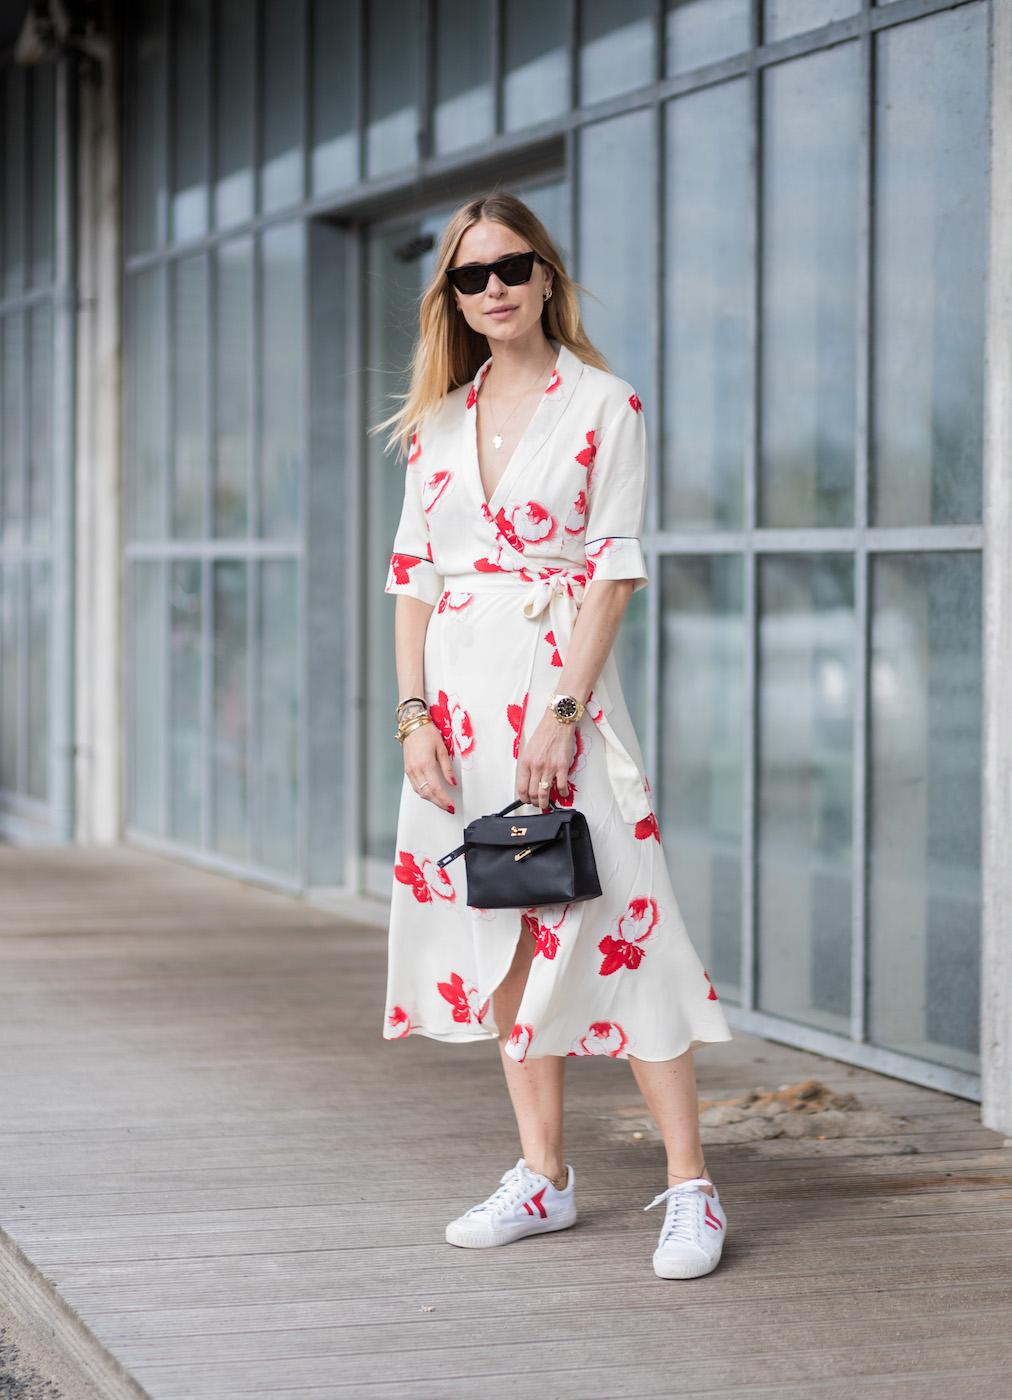 Business Casual Women: Dress Code